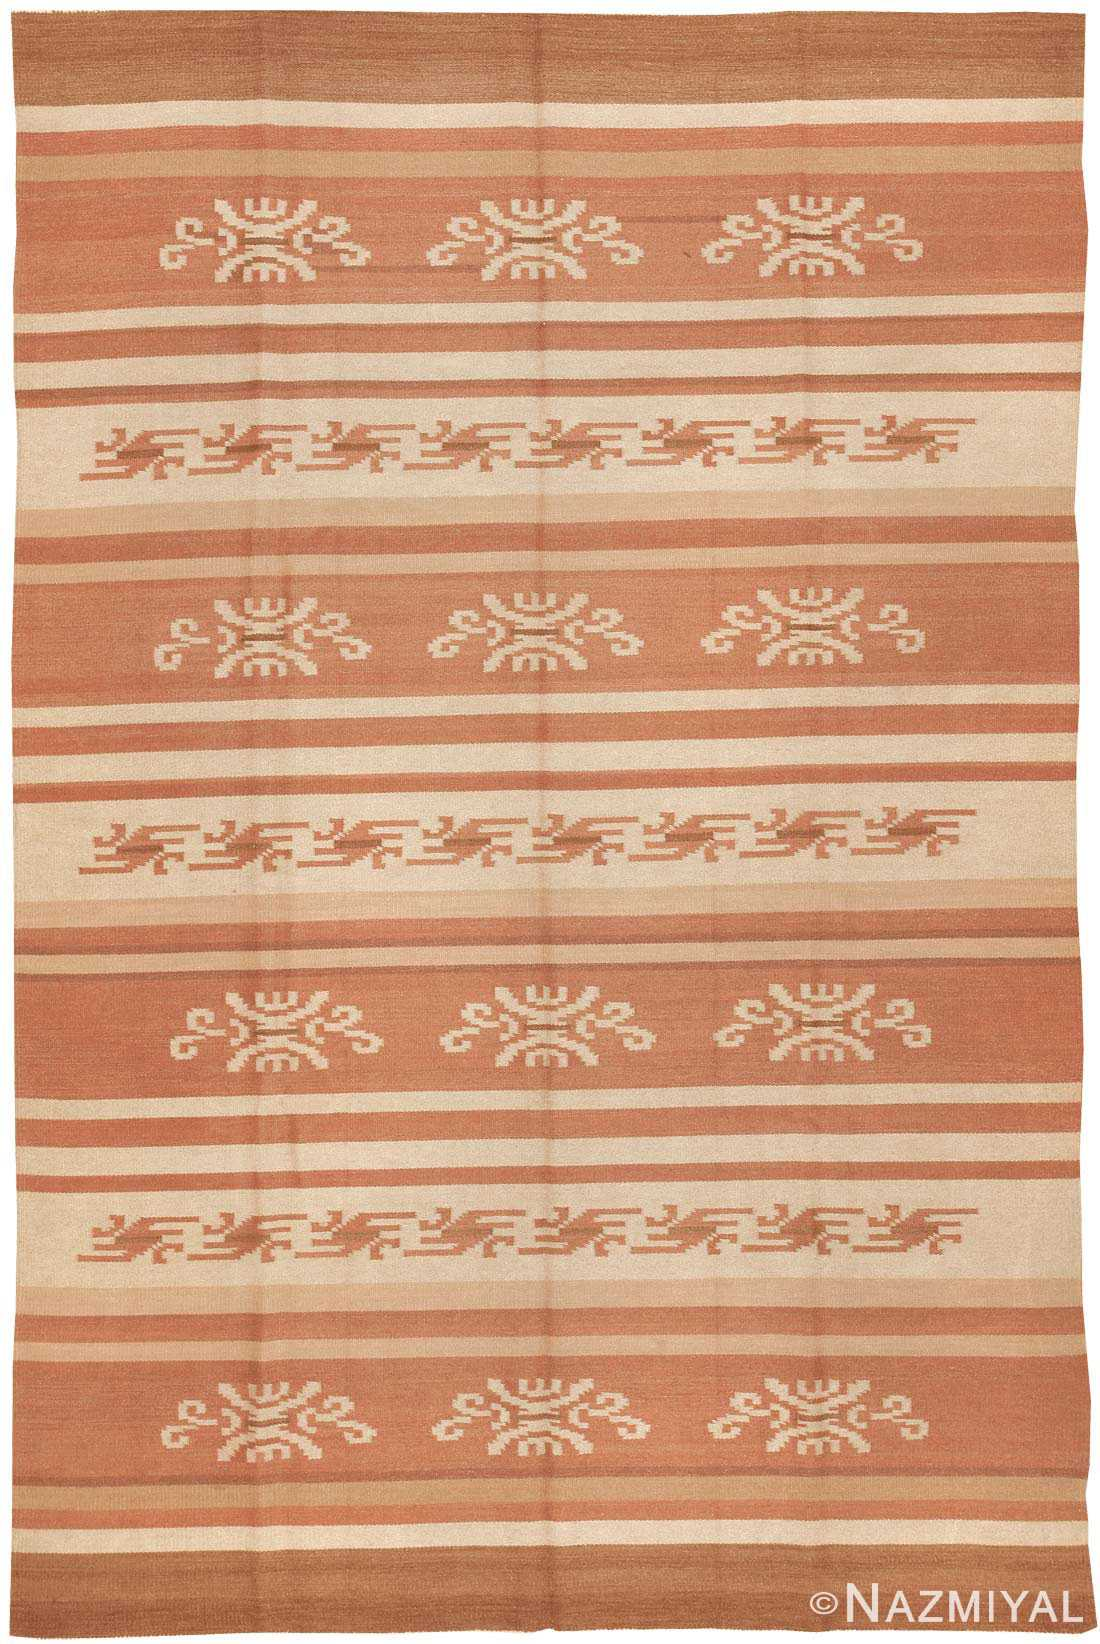 Vintage Swedish Scandinavian Kilim Rug 3381 by nazmiyal